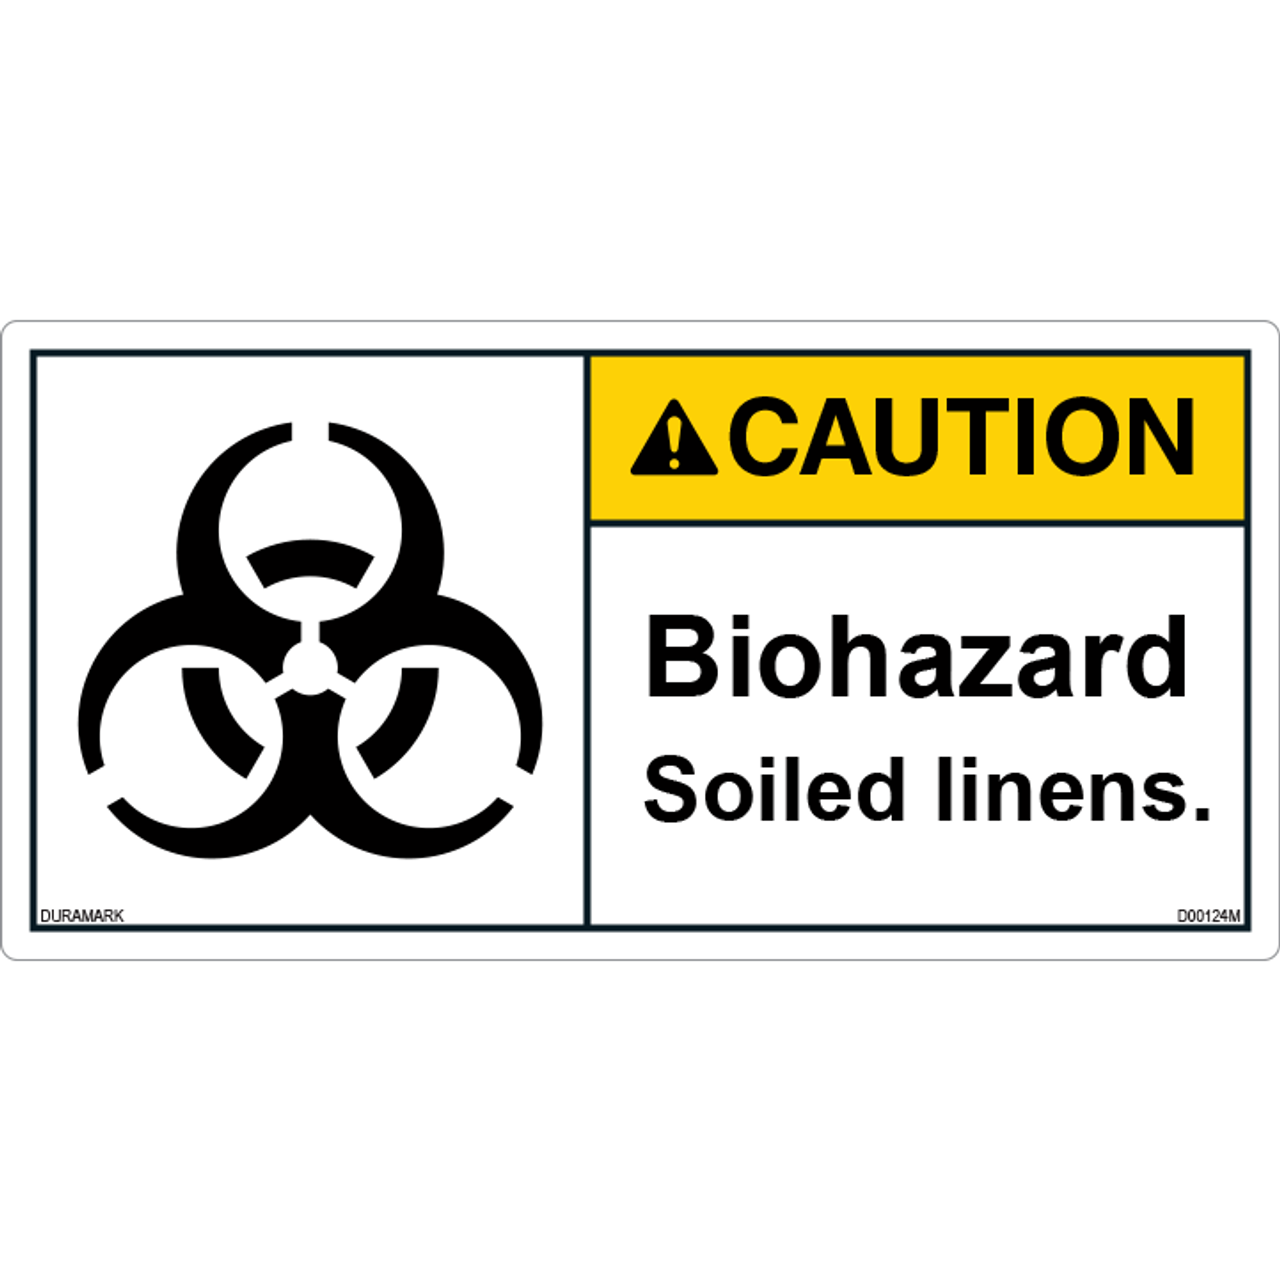 Caution - Biohazard - Soiled Linens - ANSI Safety Label